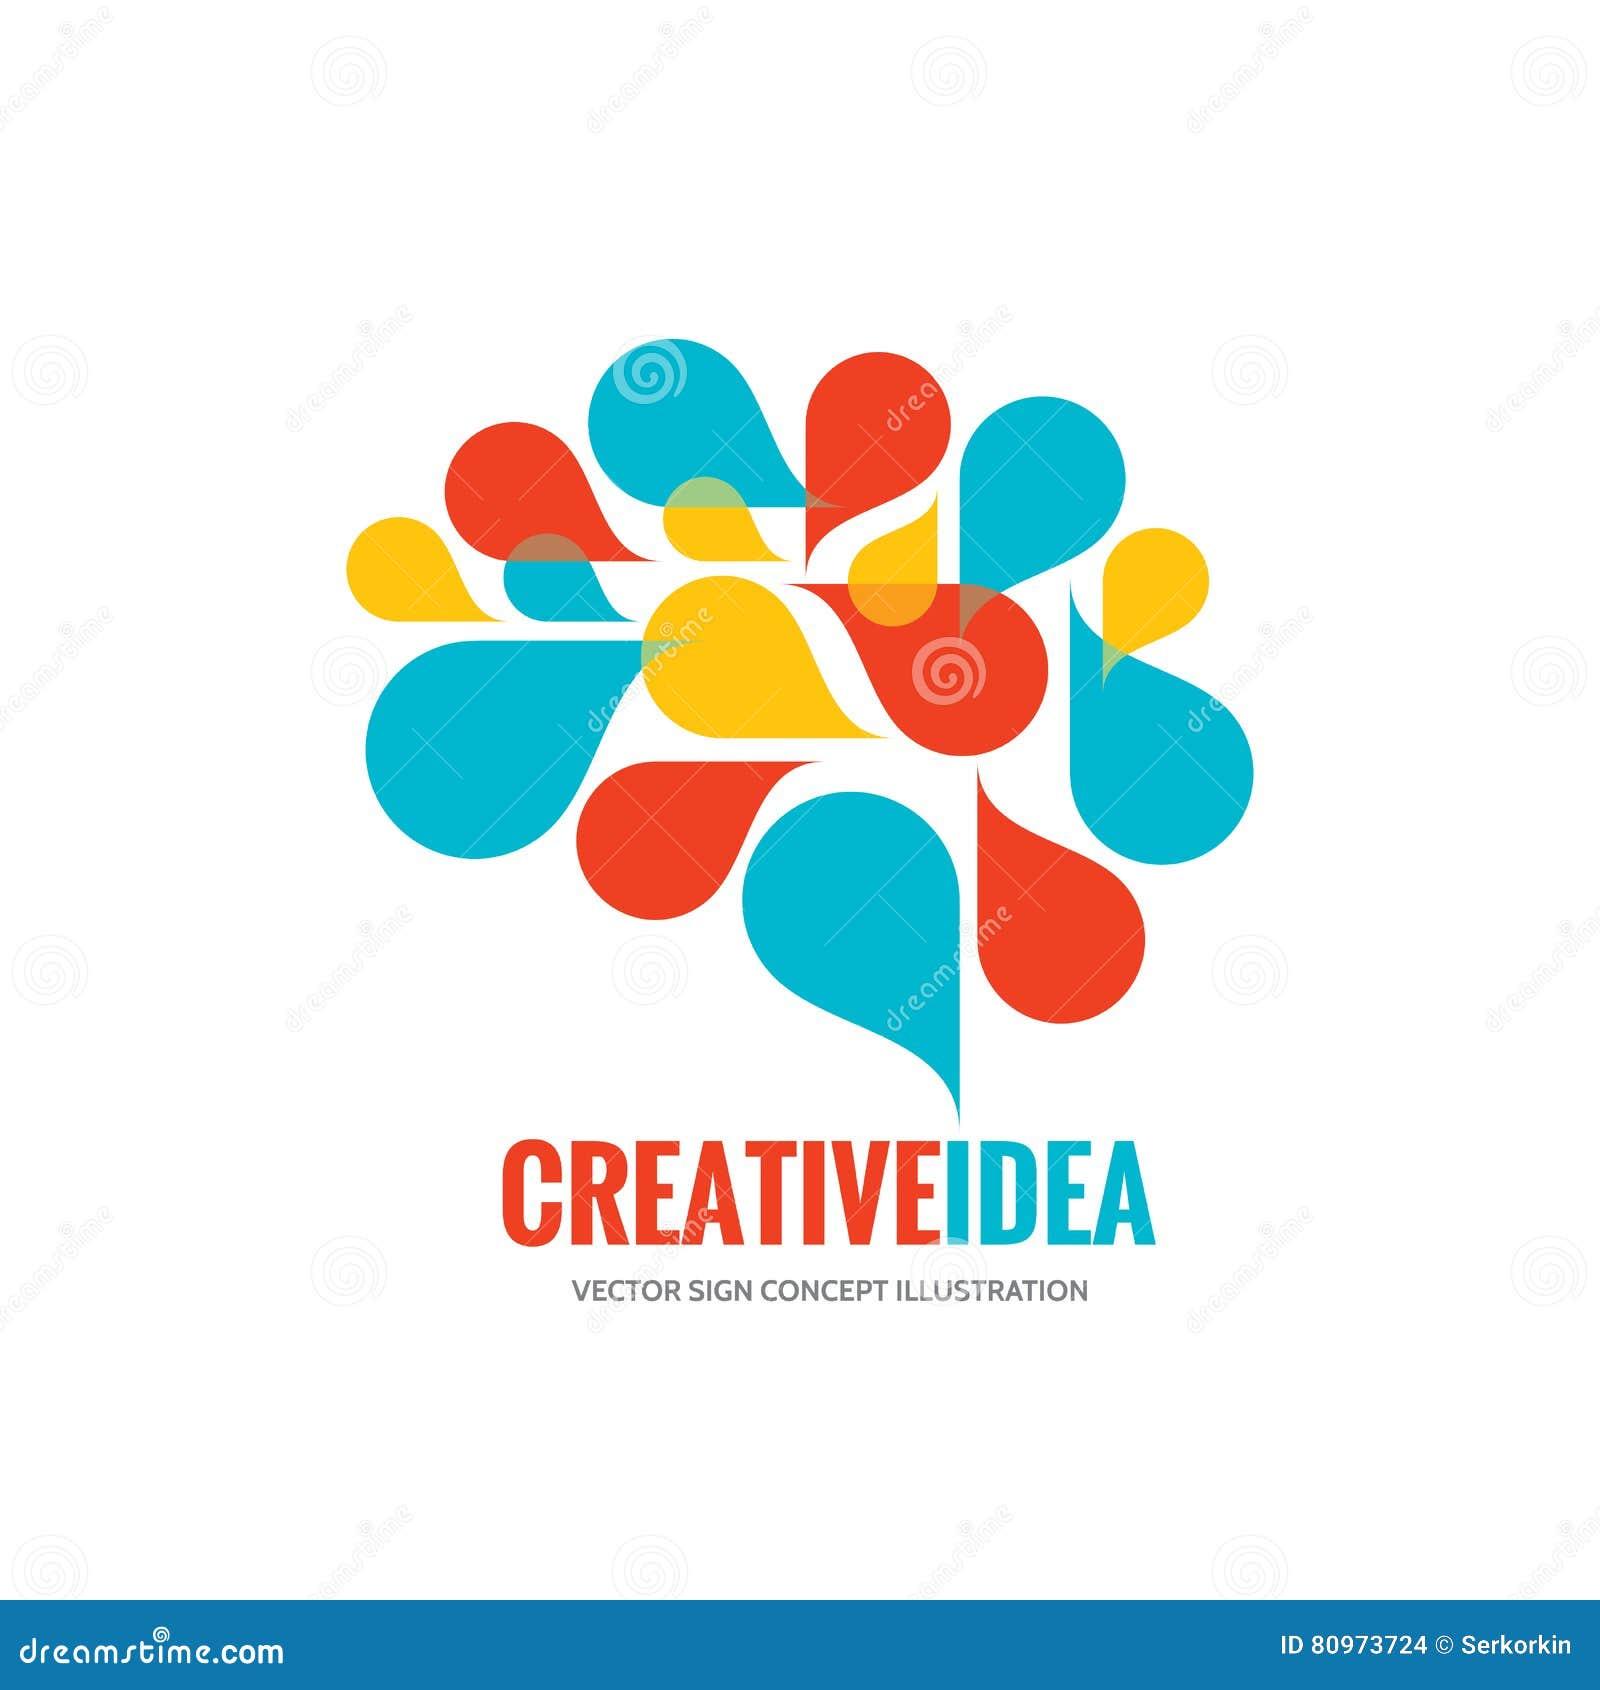 Creative idea - business vector logo template concept illustration. Abstract human brain creative sign. Infographic symbol.